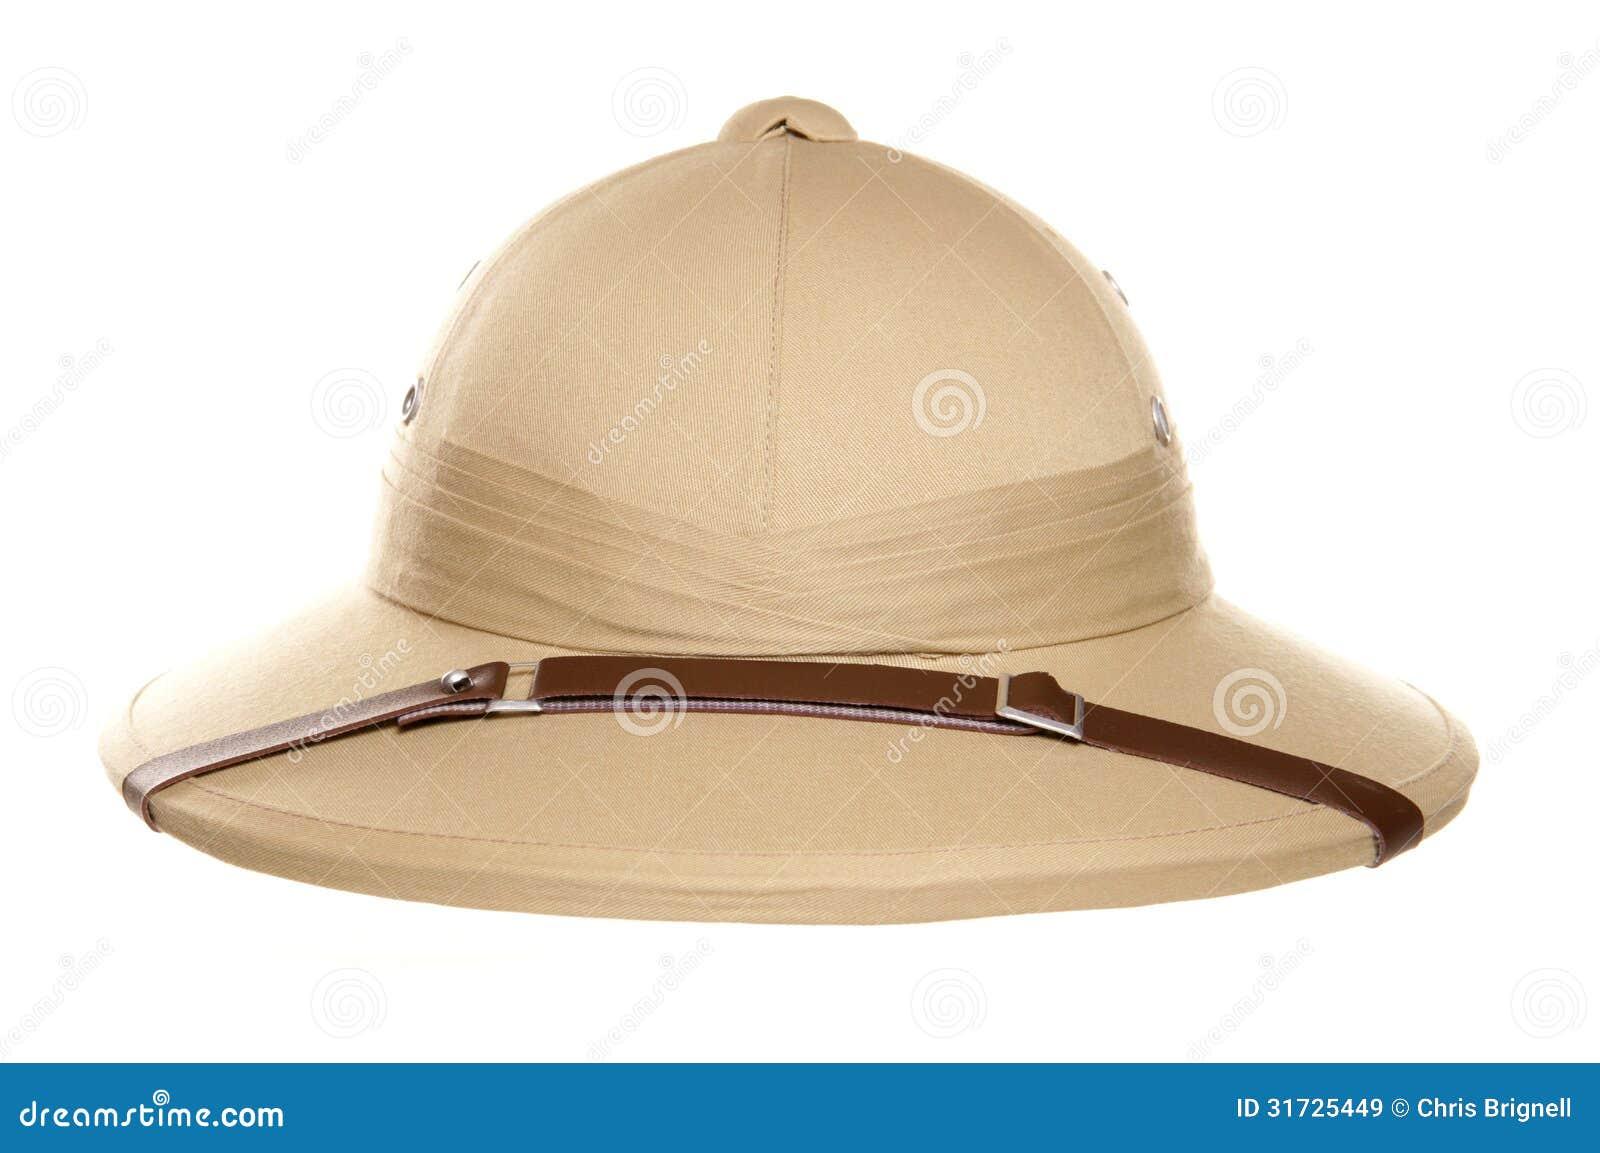 Safari Jungle Hat Royalty Free Stock Images - Image: 31725449